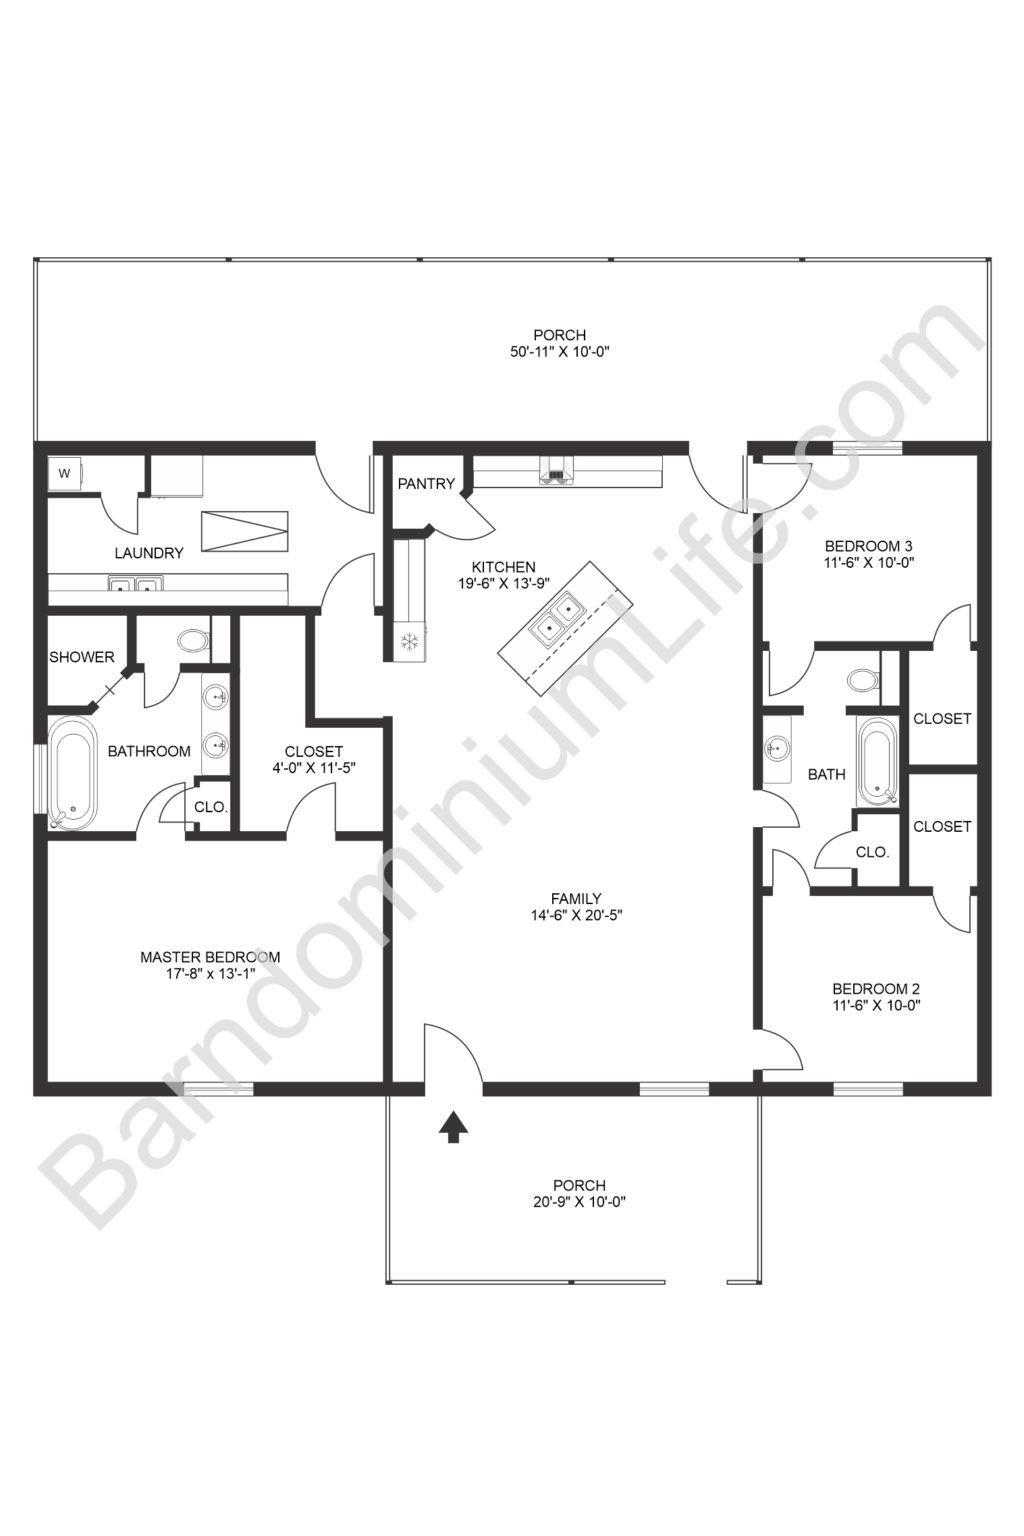 Inspiring Open Concept Barndominium Floor Plans In 2020 Barndominium Floor Plans Barn Homes Floor Plans House Layout Plans